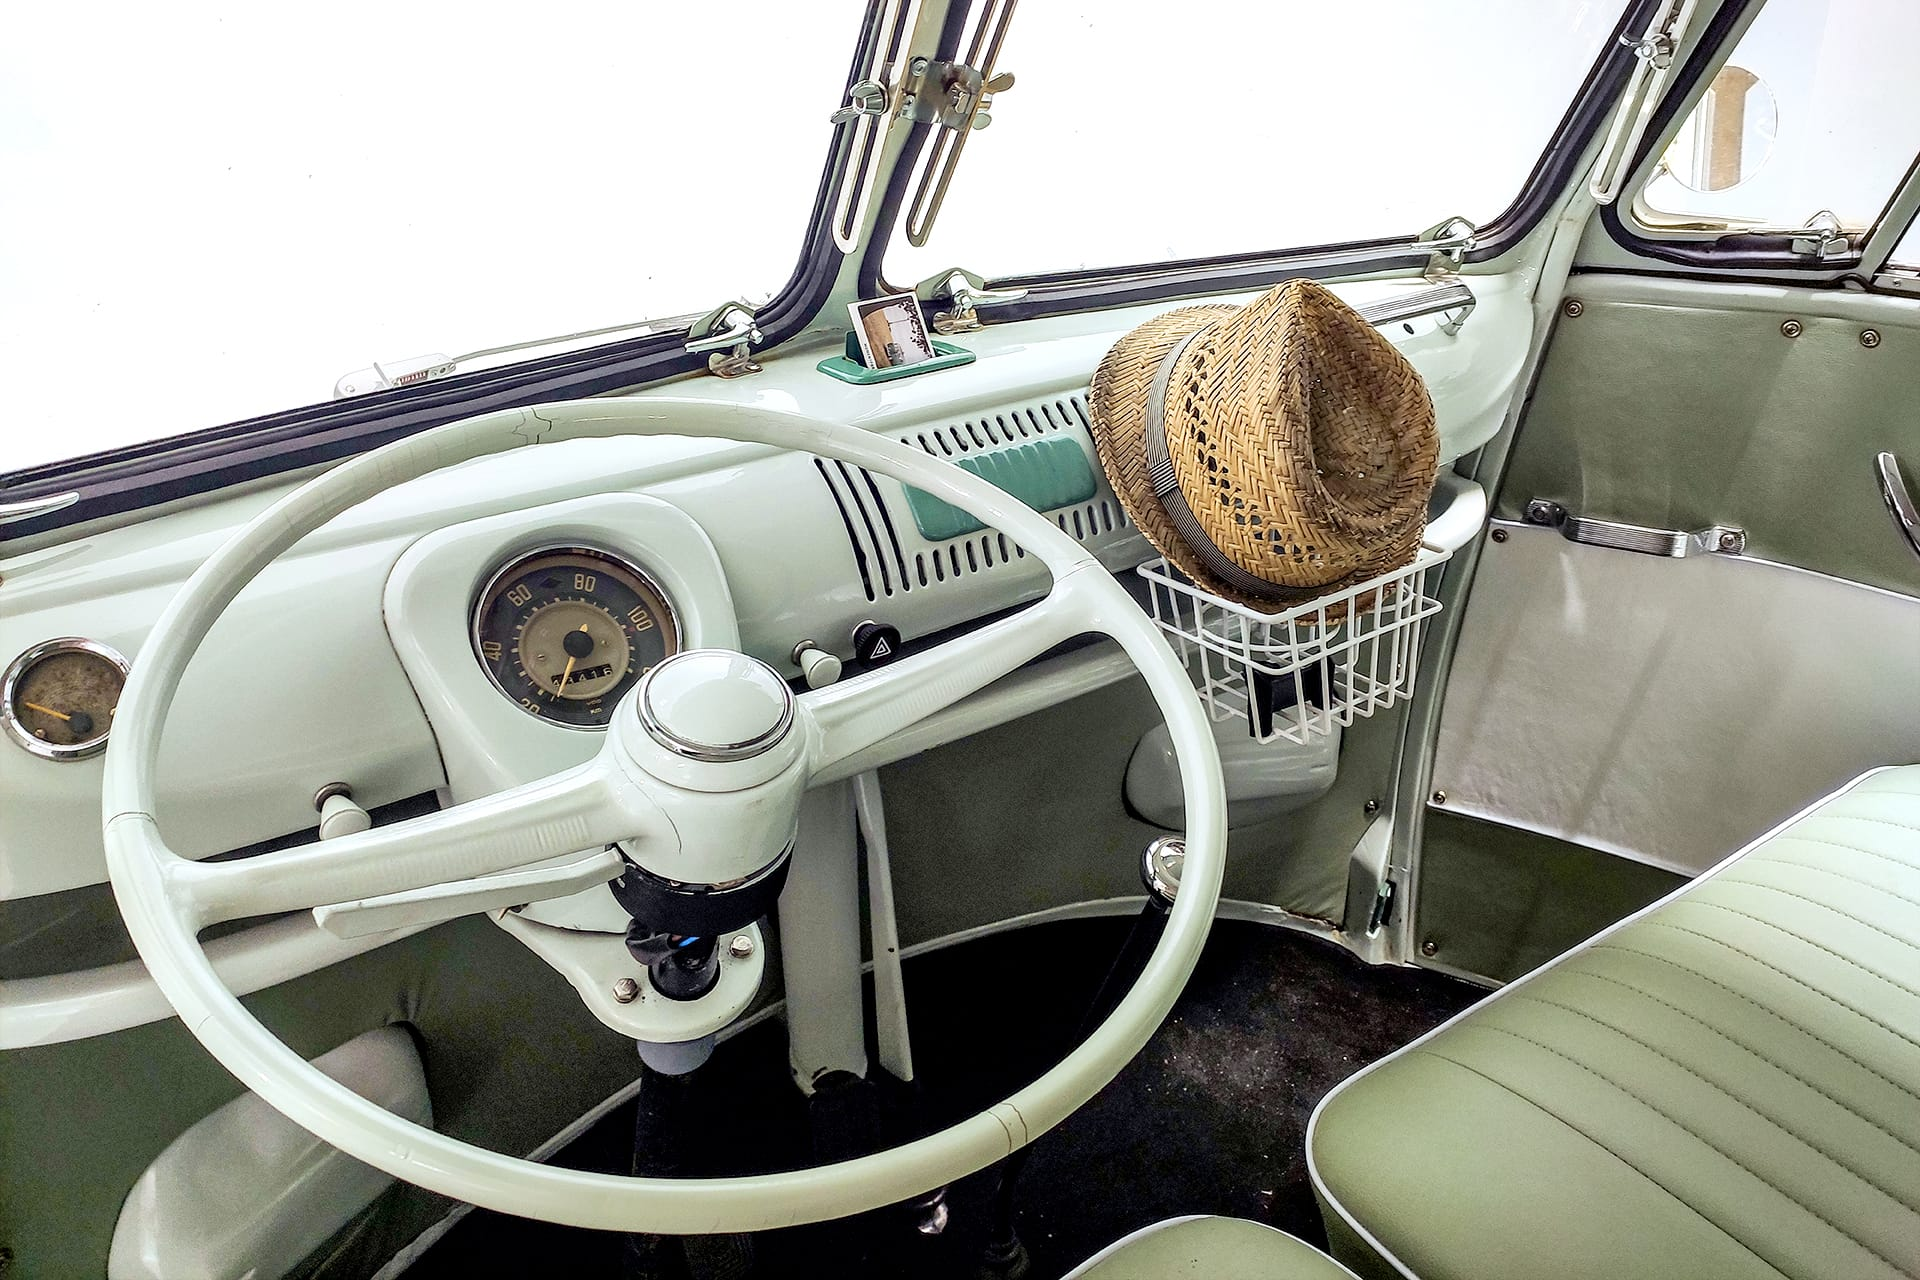 VW T1 Bulli Innenraum Lenkrad Getränkehalterung Leder Fahrersitz